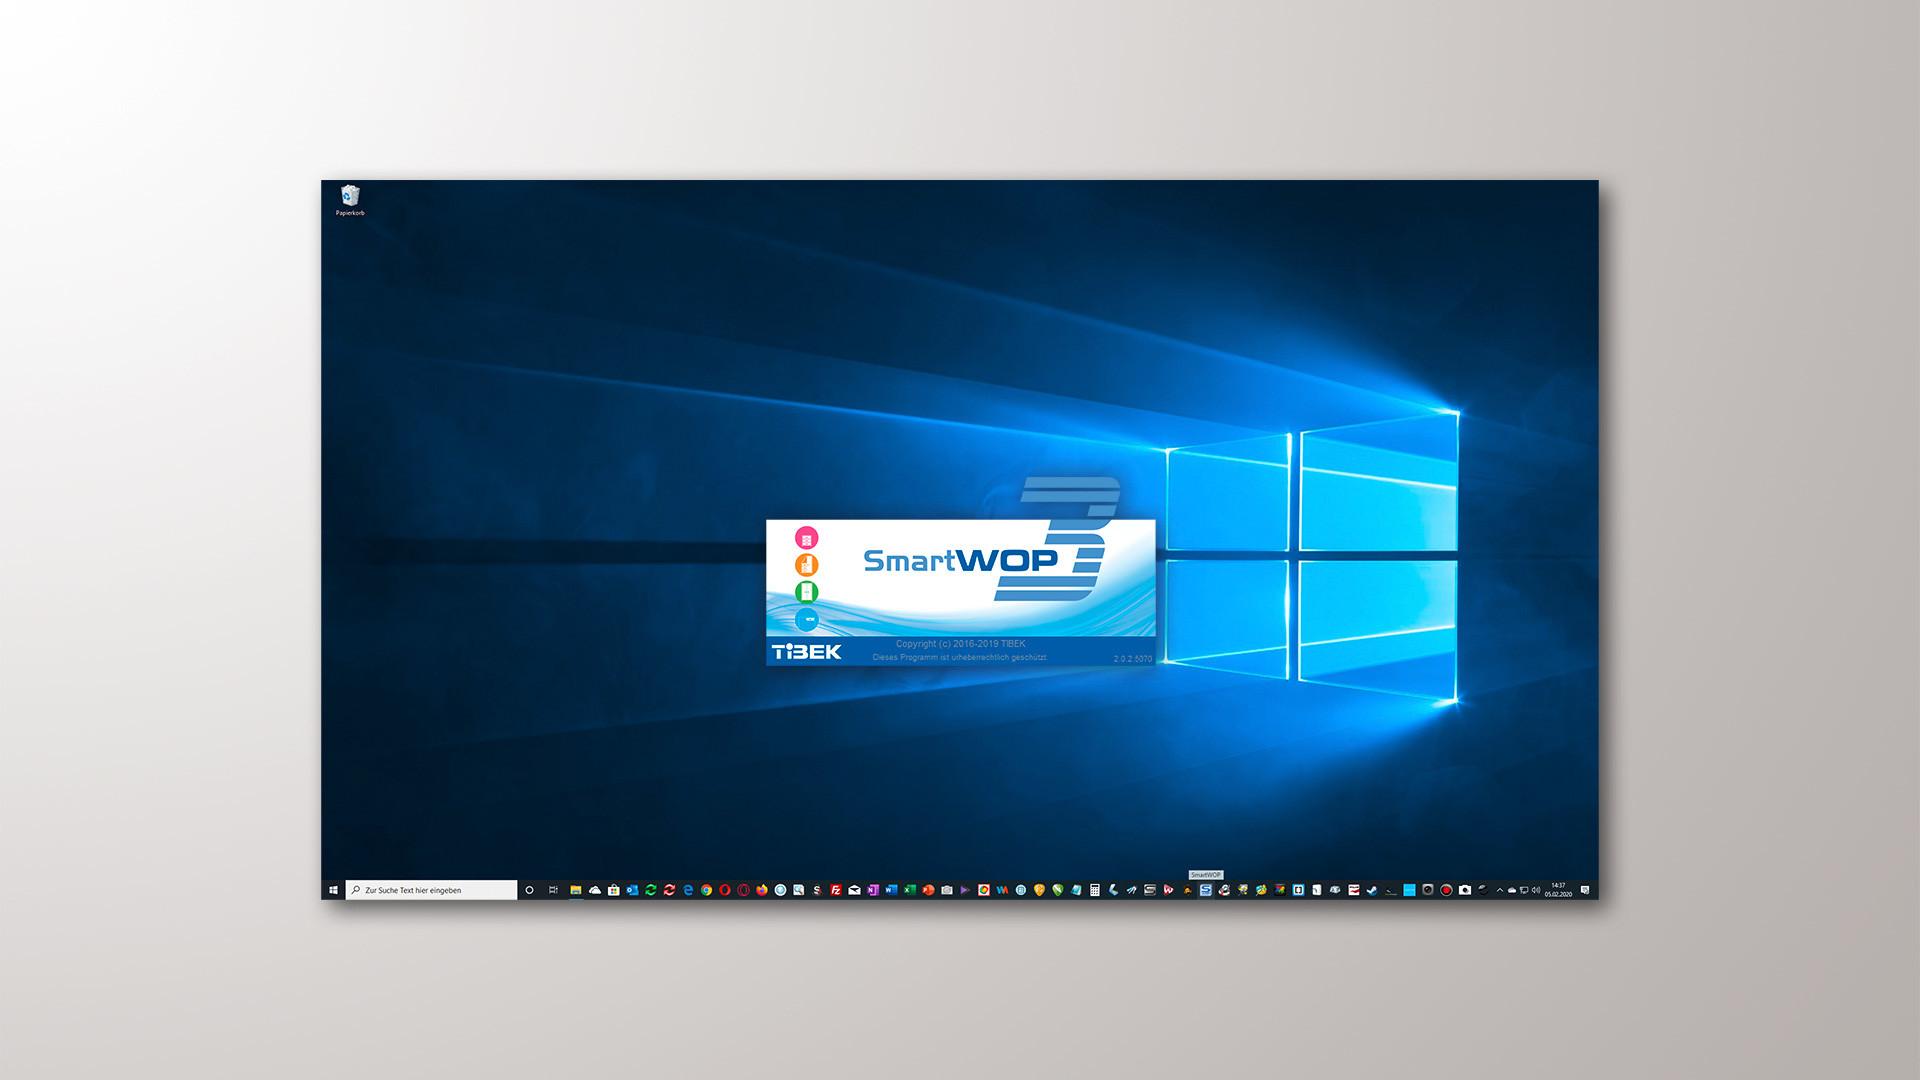 SmartWOP_Splashscreen_neu